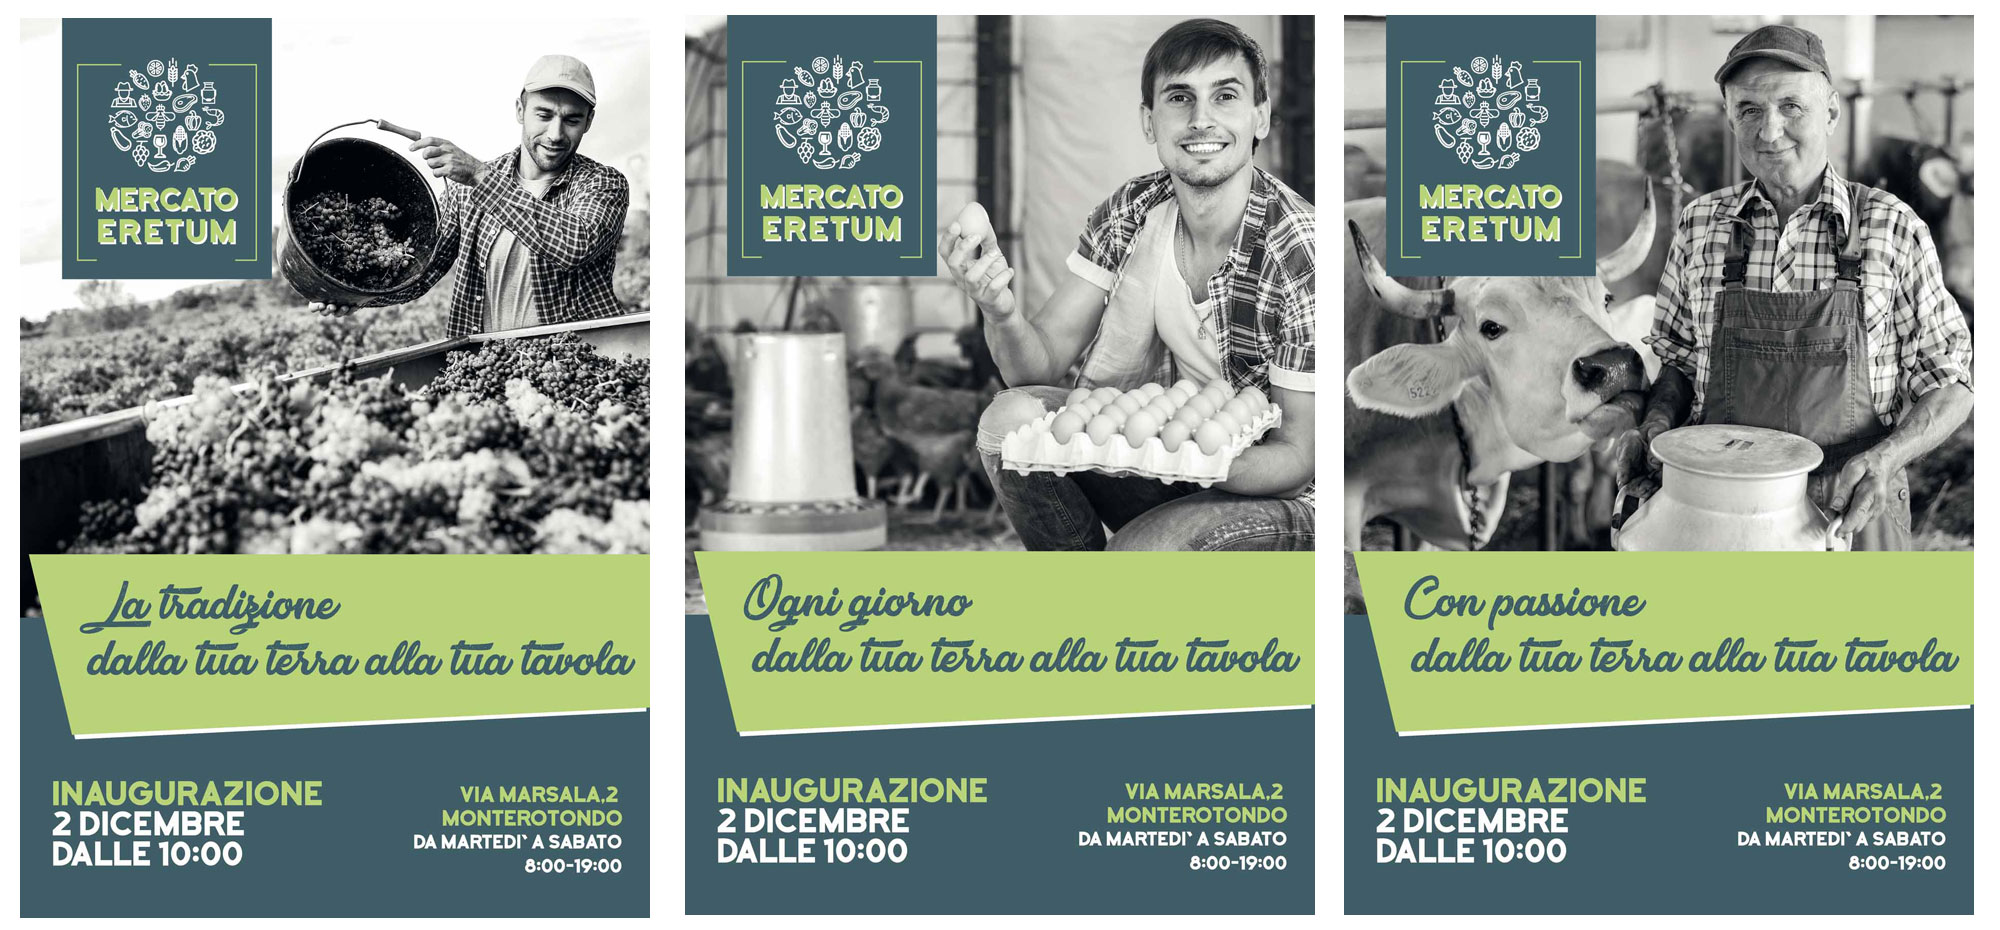 Campagna Mercato Eretum